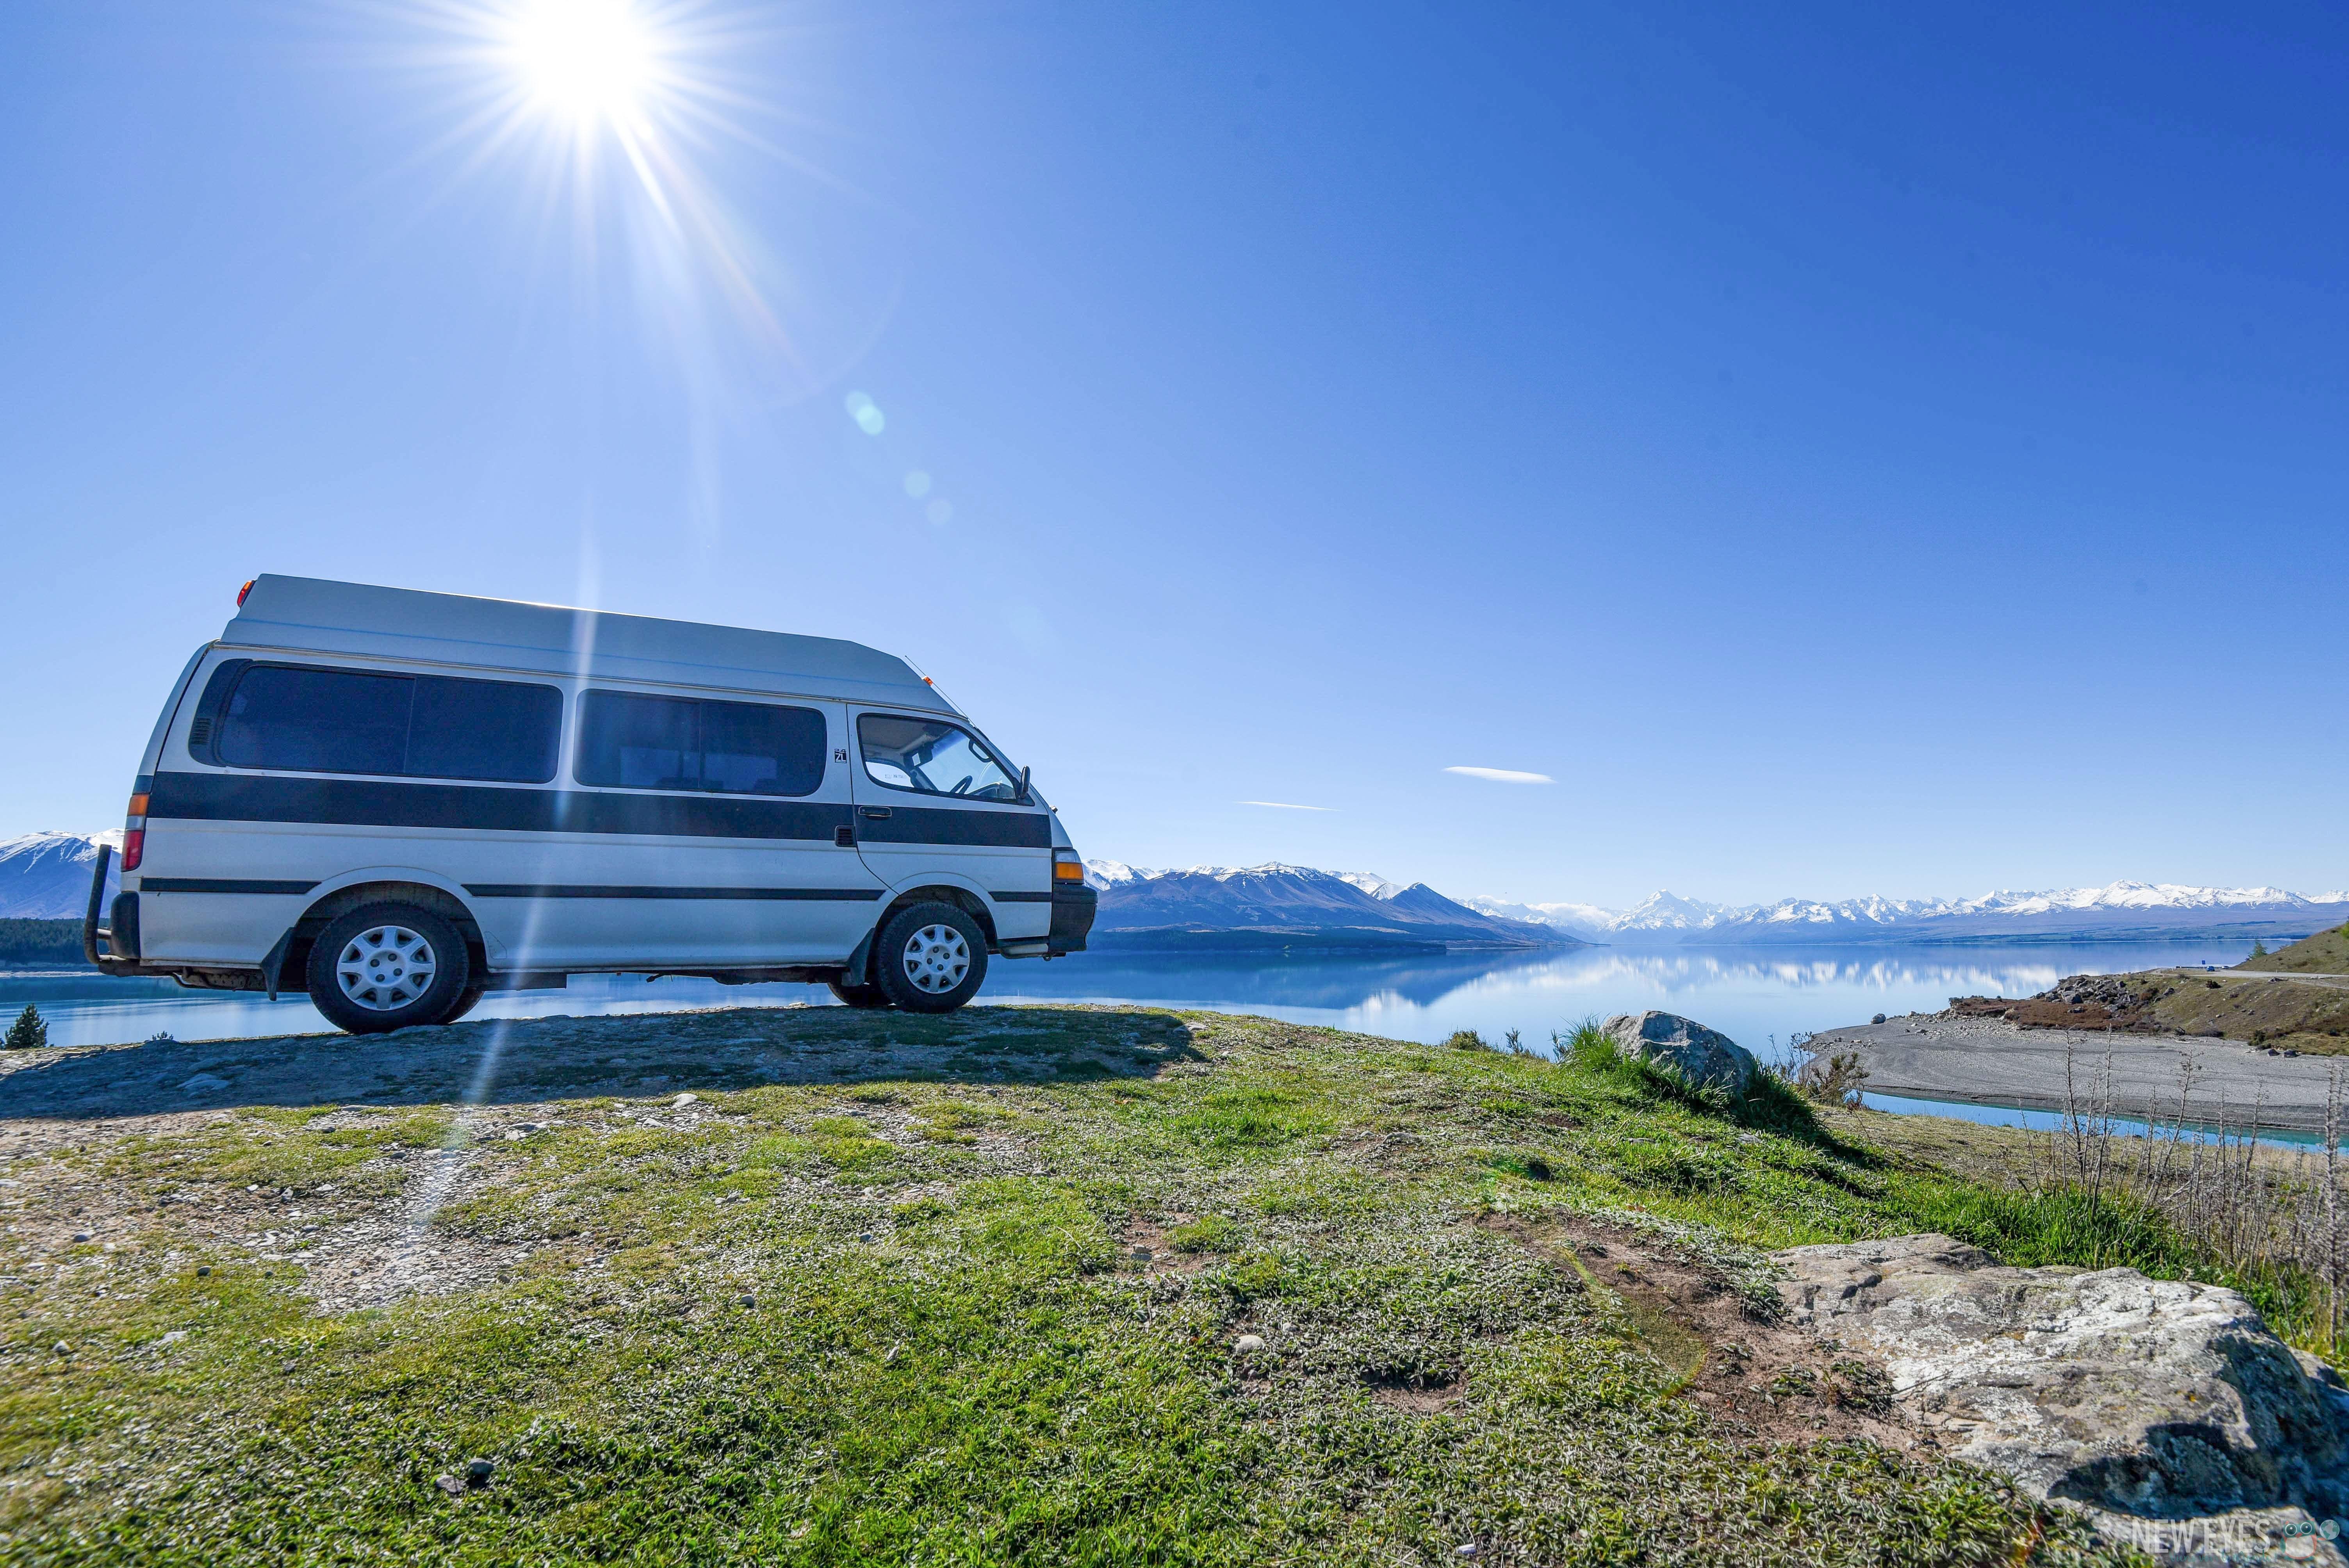 Notre van au lake Pukaki